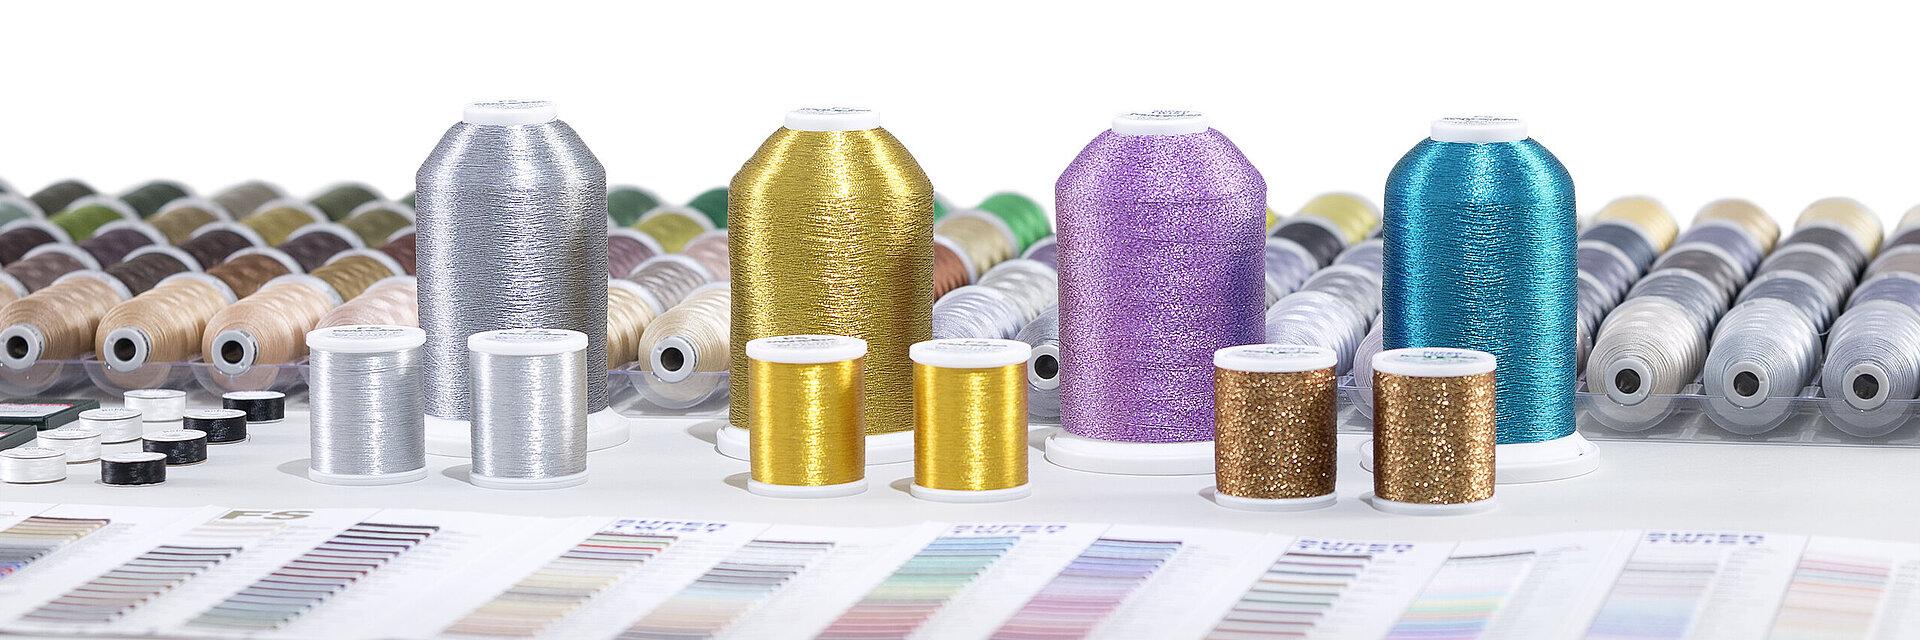 Madeira Metallic Thread FS40 200m Gold 7